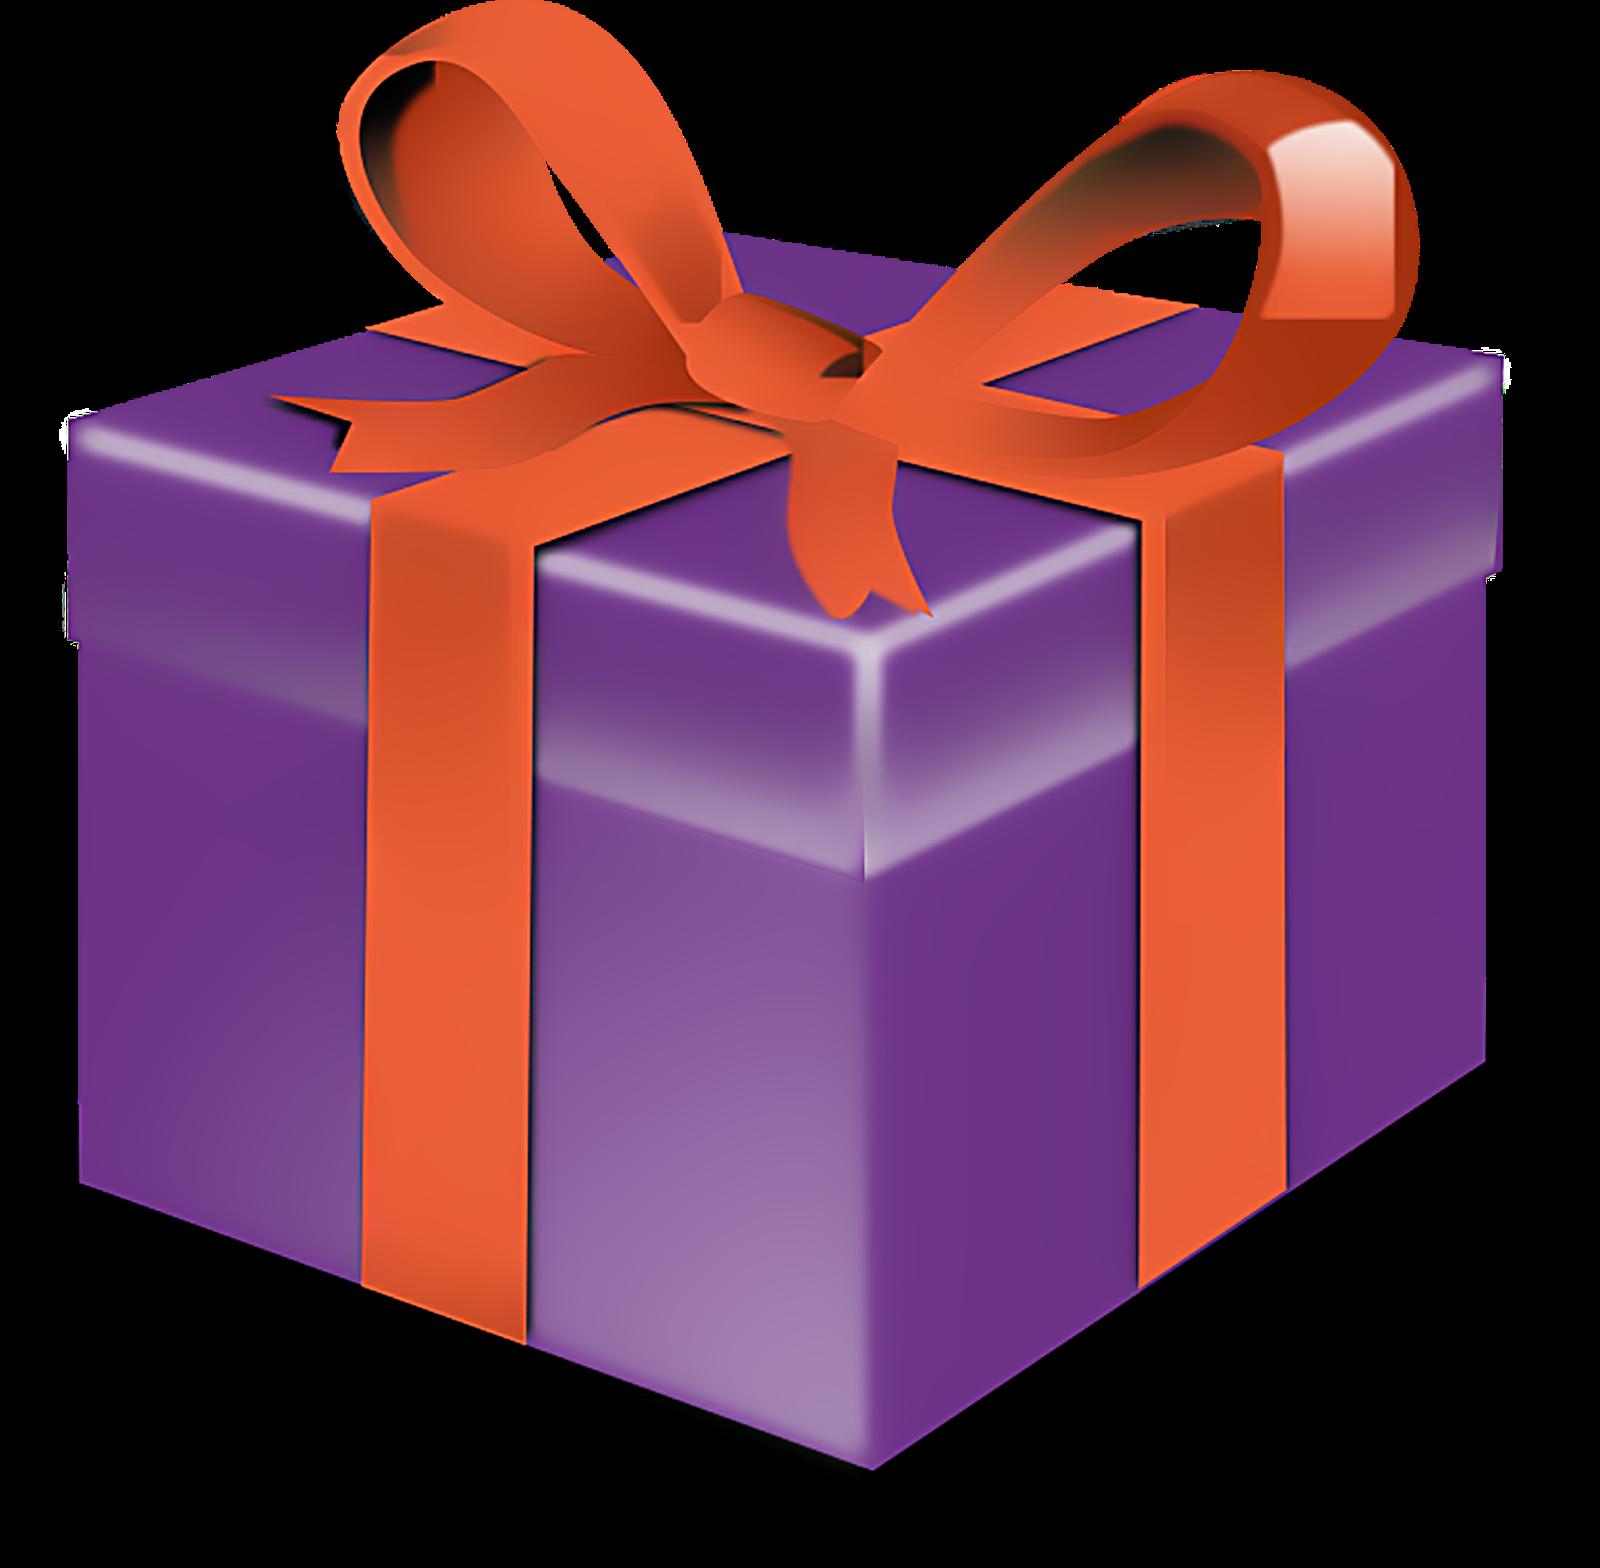 Present Box Clipart at GetDrawings